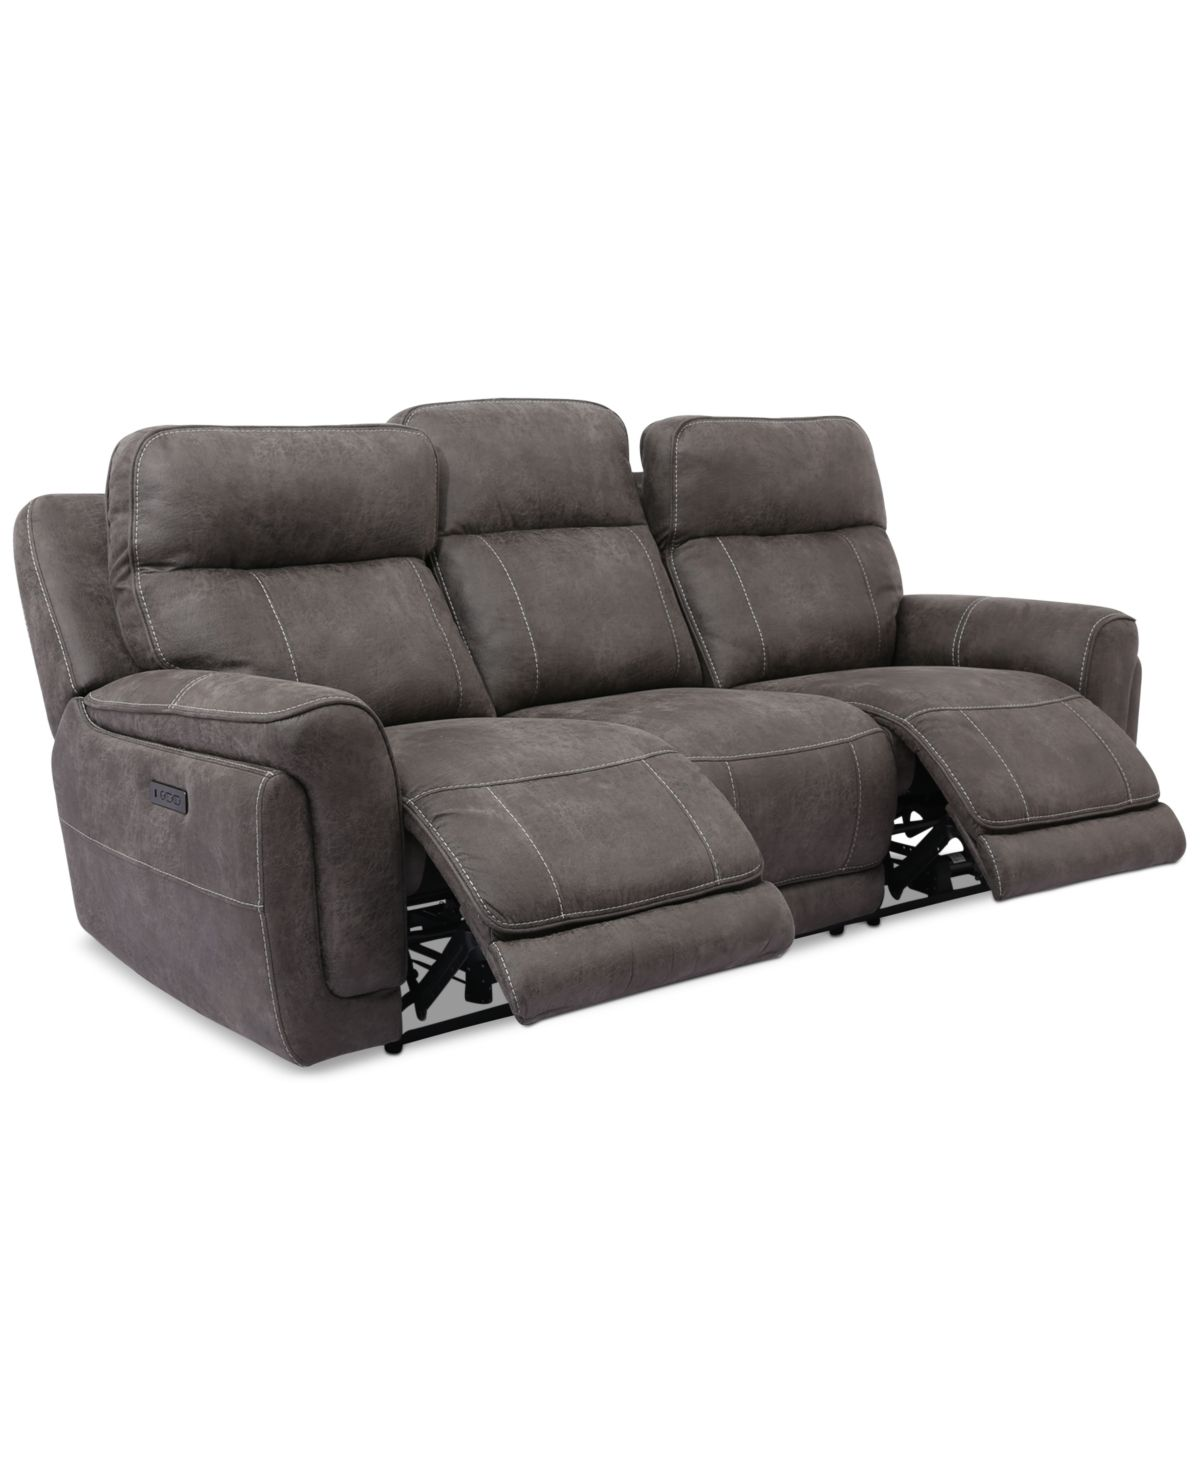 Bryer 91 Fabric Dual Power Sofa Northwest Stucco Tan